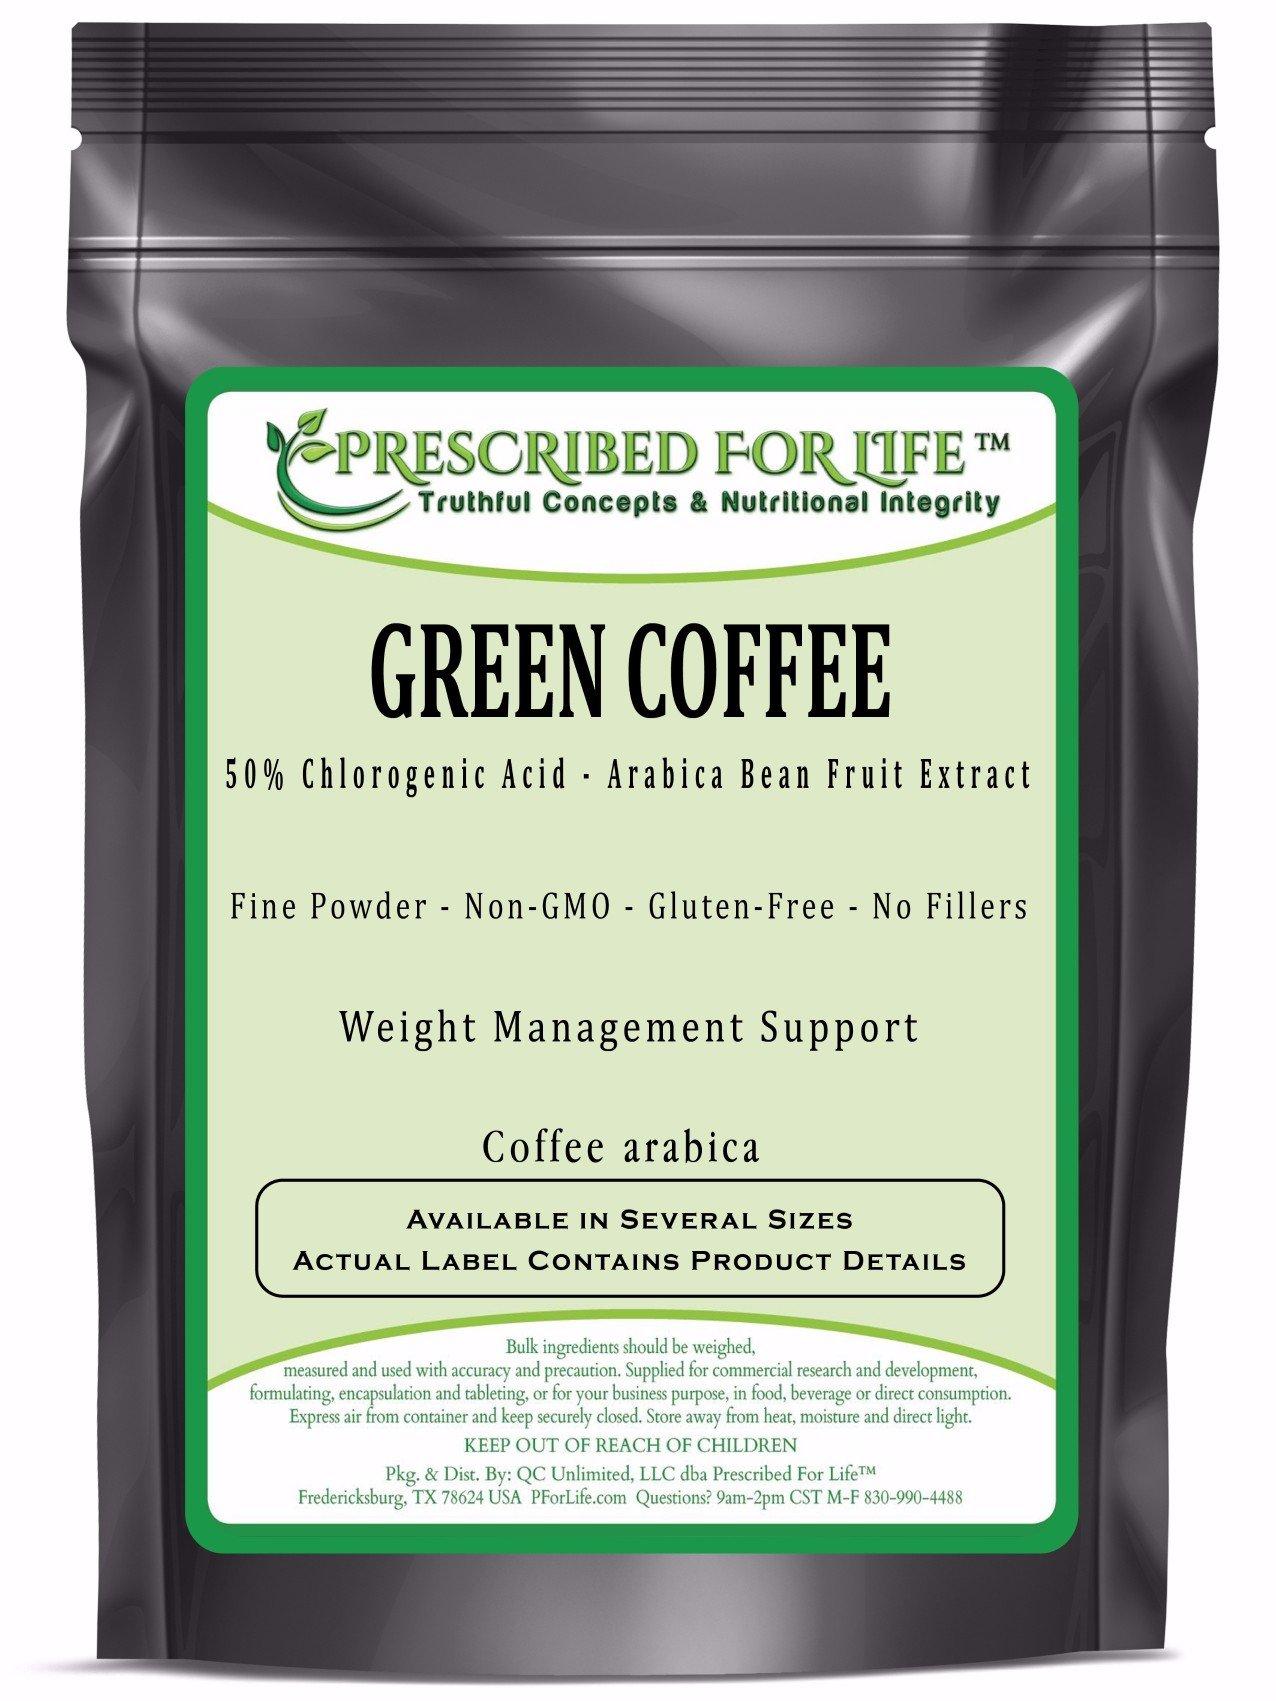 Green Coffee - 50% Chlorogenic Acid - Arabica Bean Fruit Extract Powder (Coffea Arabica), 1 kg by Prescribed For Life (Image #1)